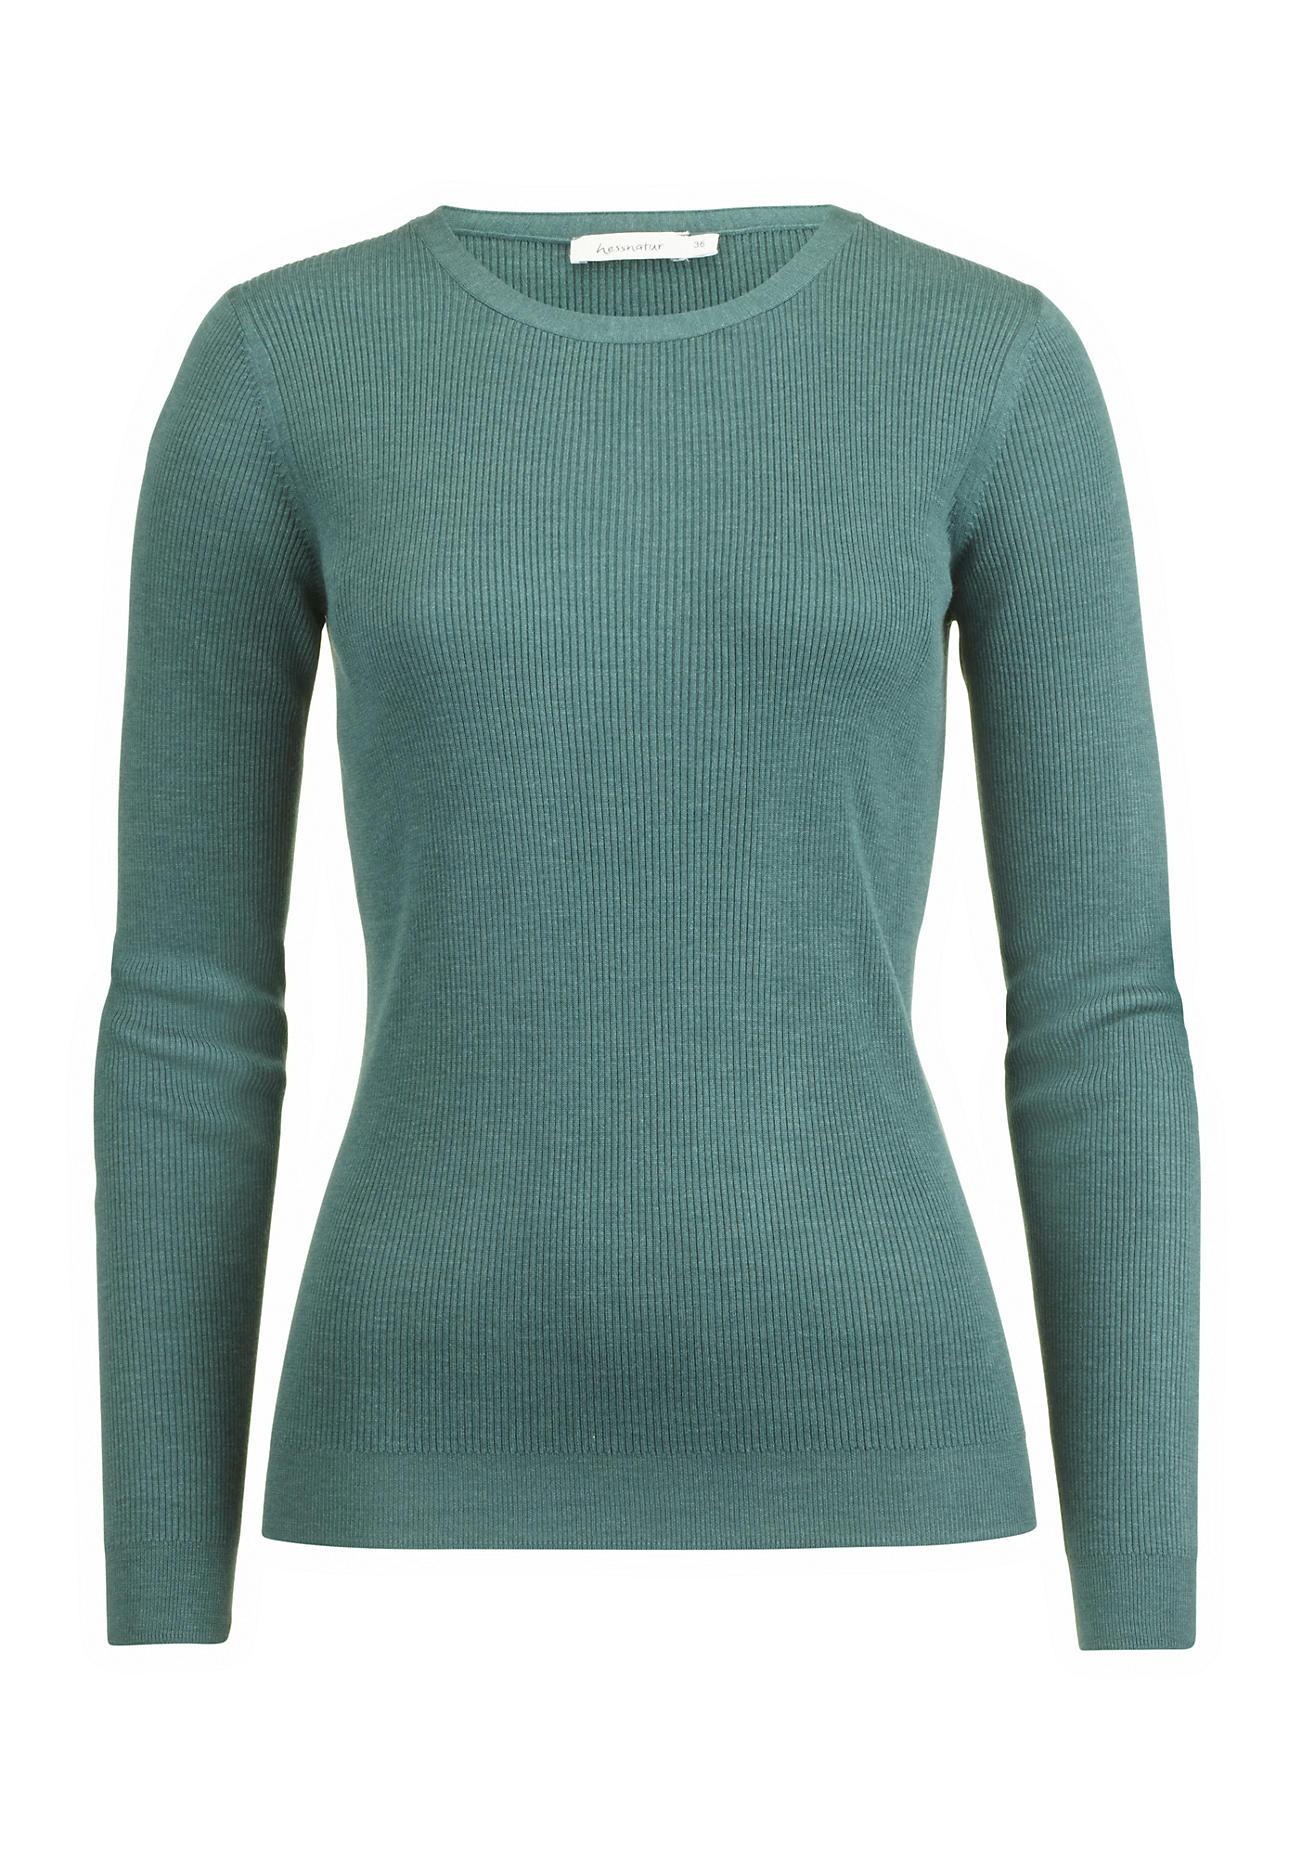 hessnatur Damen Pullover aus Eri-Seide – grün – Größe 38